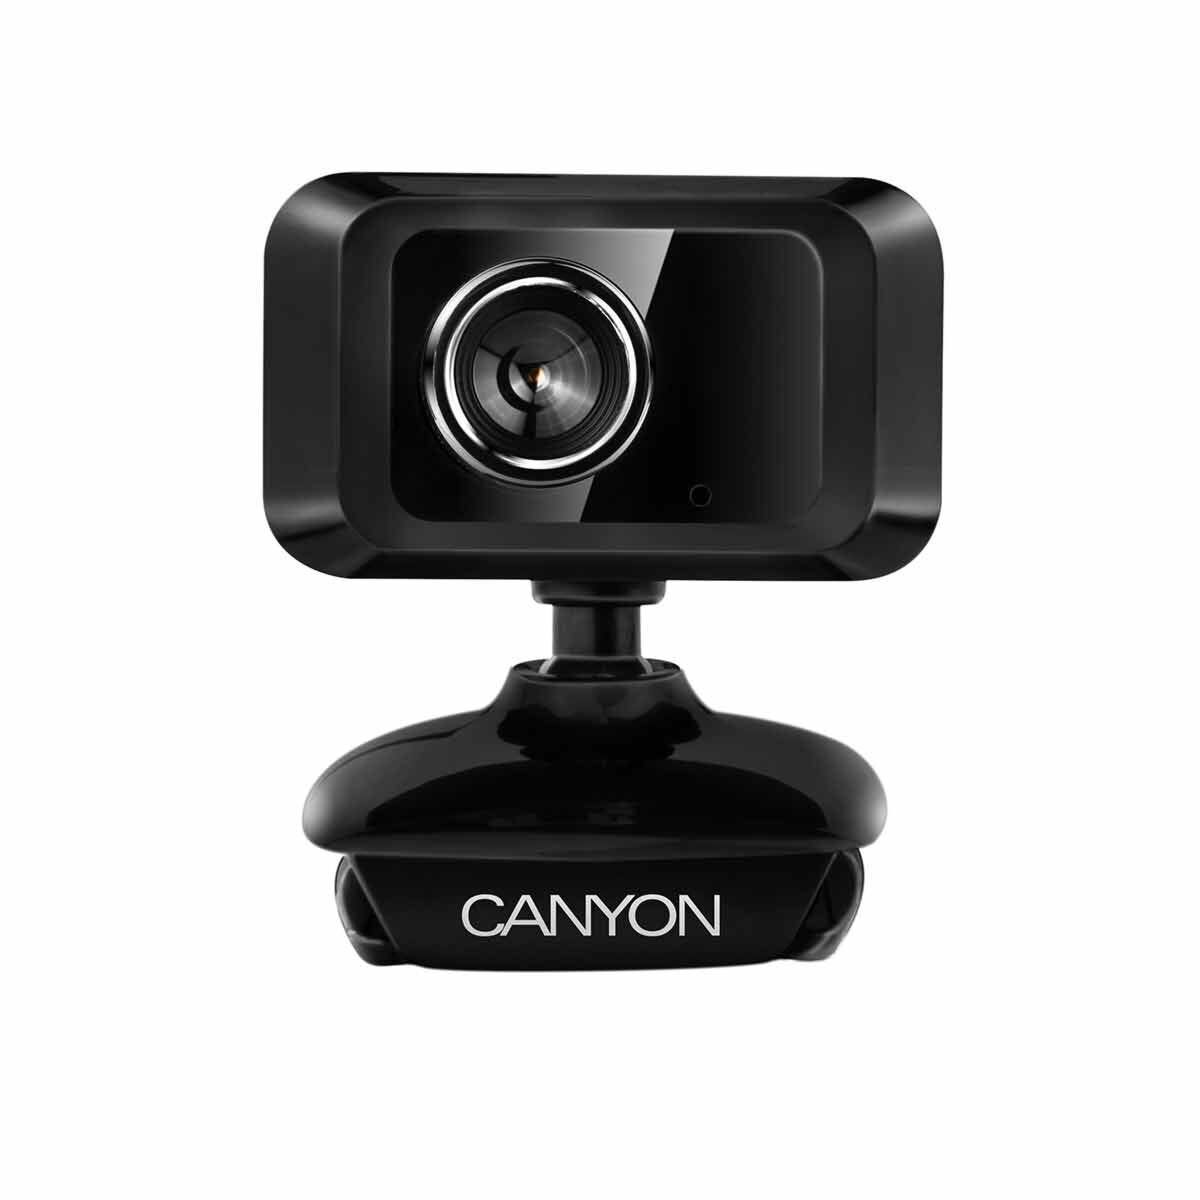 Canyon USB 2.0 Webcam 1.3 Megapixels